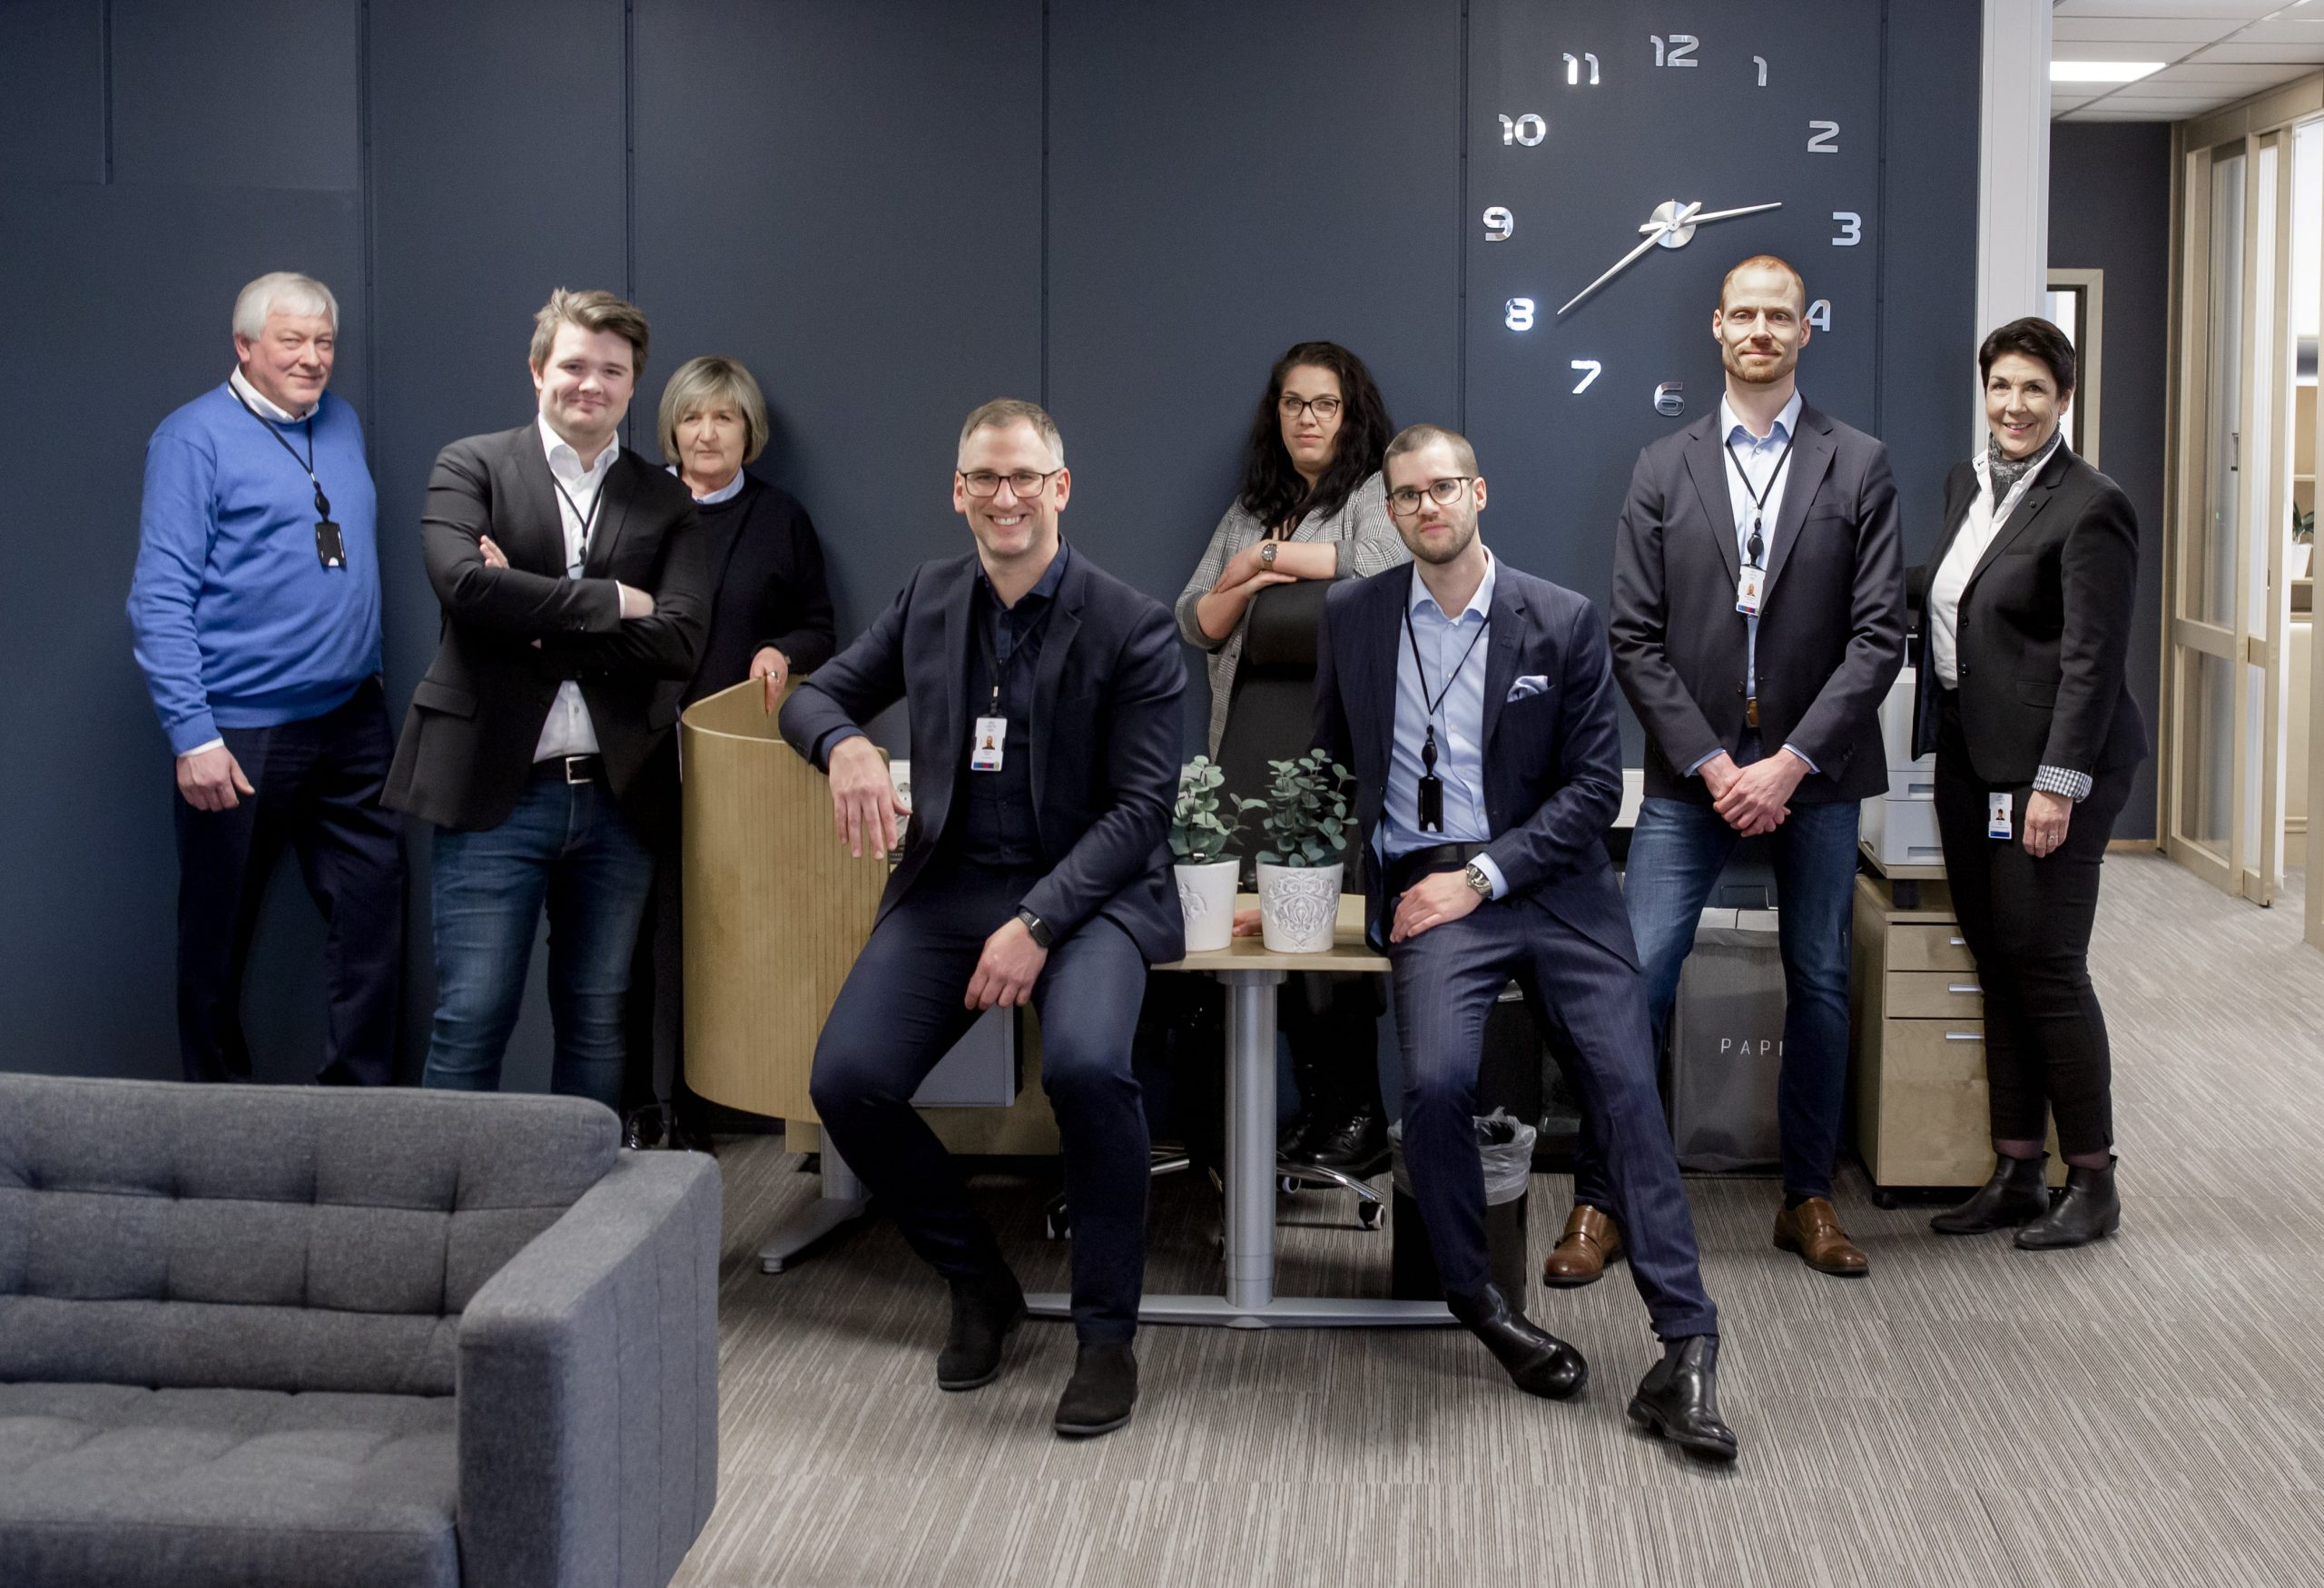 Unite Global sikrer deres andre 5,25 millioner dollar investering fra Svea